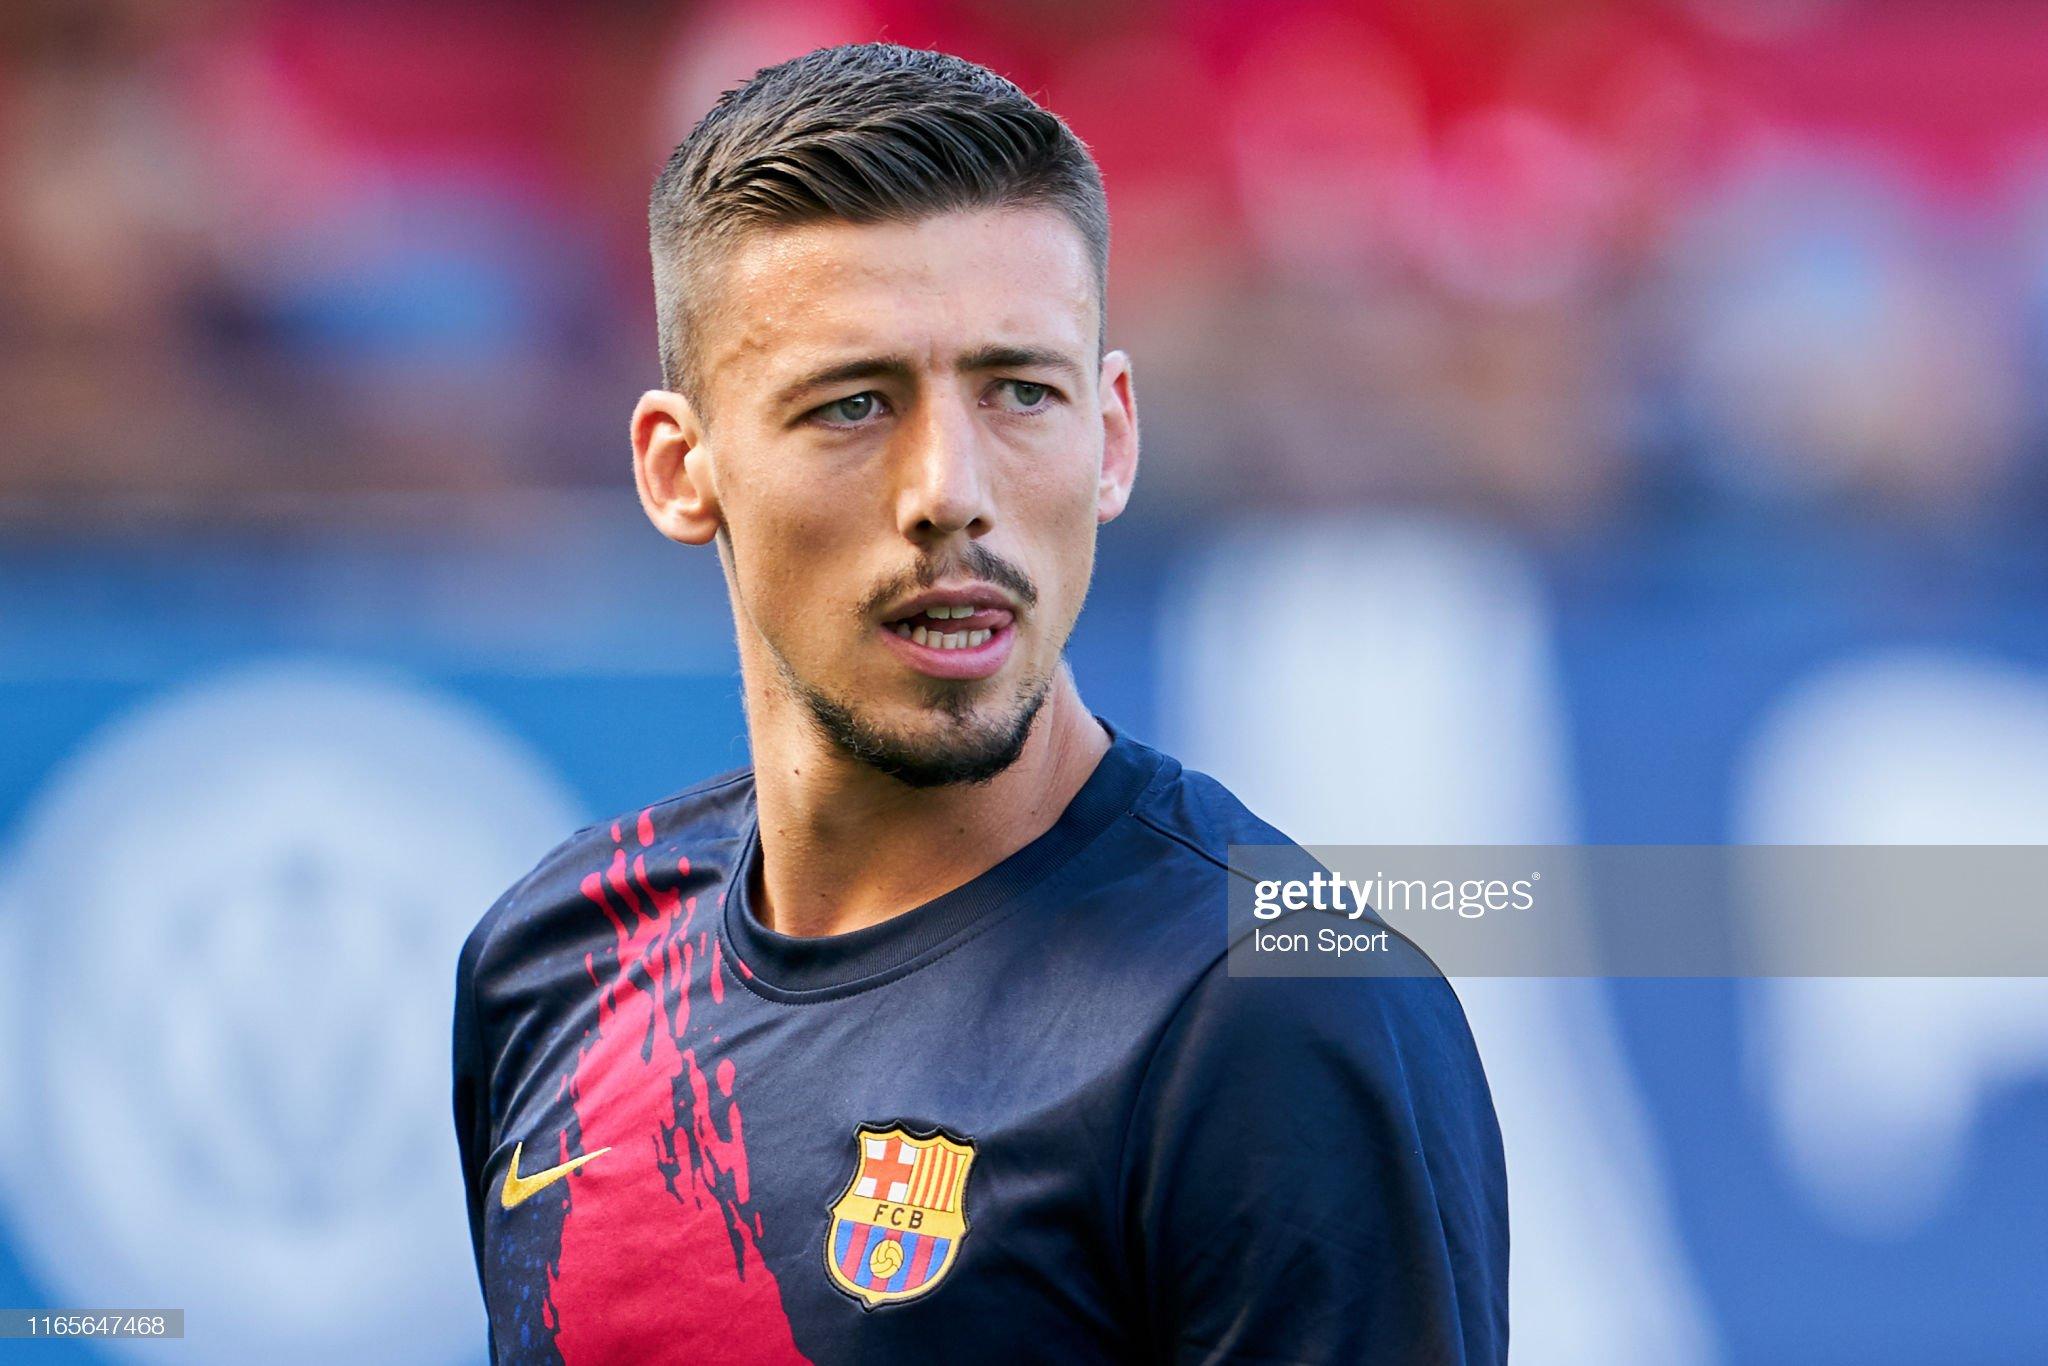 صور مباراة : أوساسونا - برشلونة 2-2 ( 31-08-2019 )  Clement-lenglet-of-fc-barcelona-during-the-liga-match-between-osasuna-picture-id1165647468?s=2048x2048